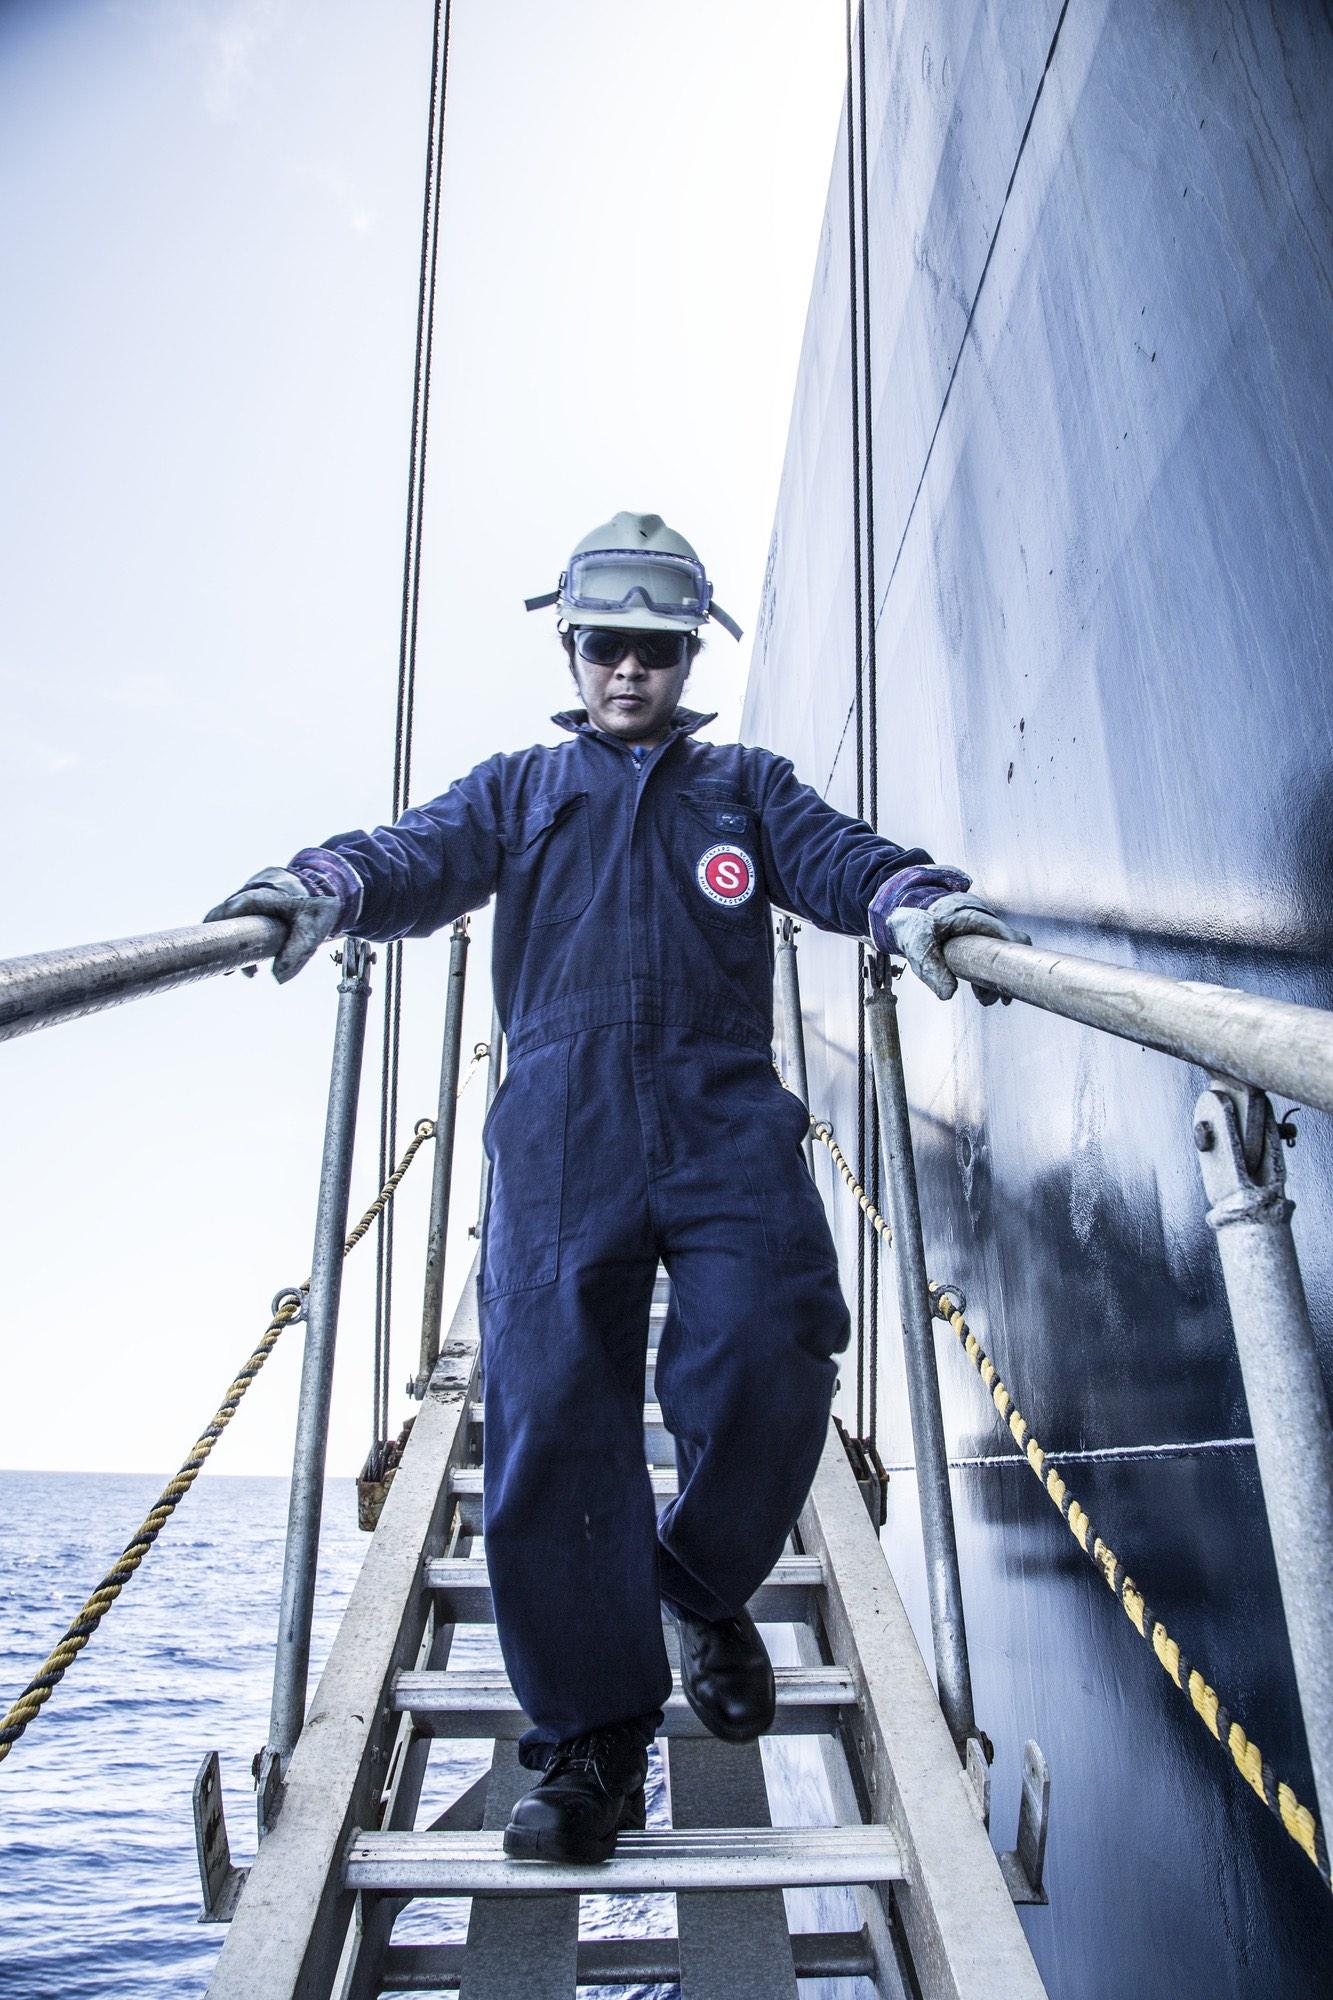 a-crew-member-on-a-trafigura-oil-tanker_15658696489_o-squashed.jpg